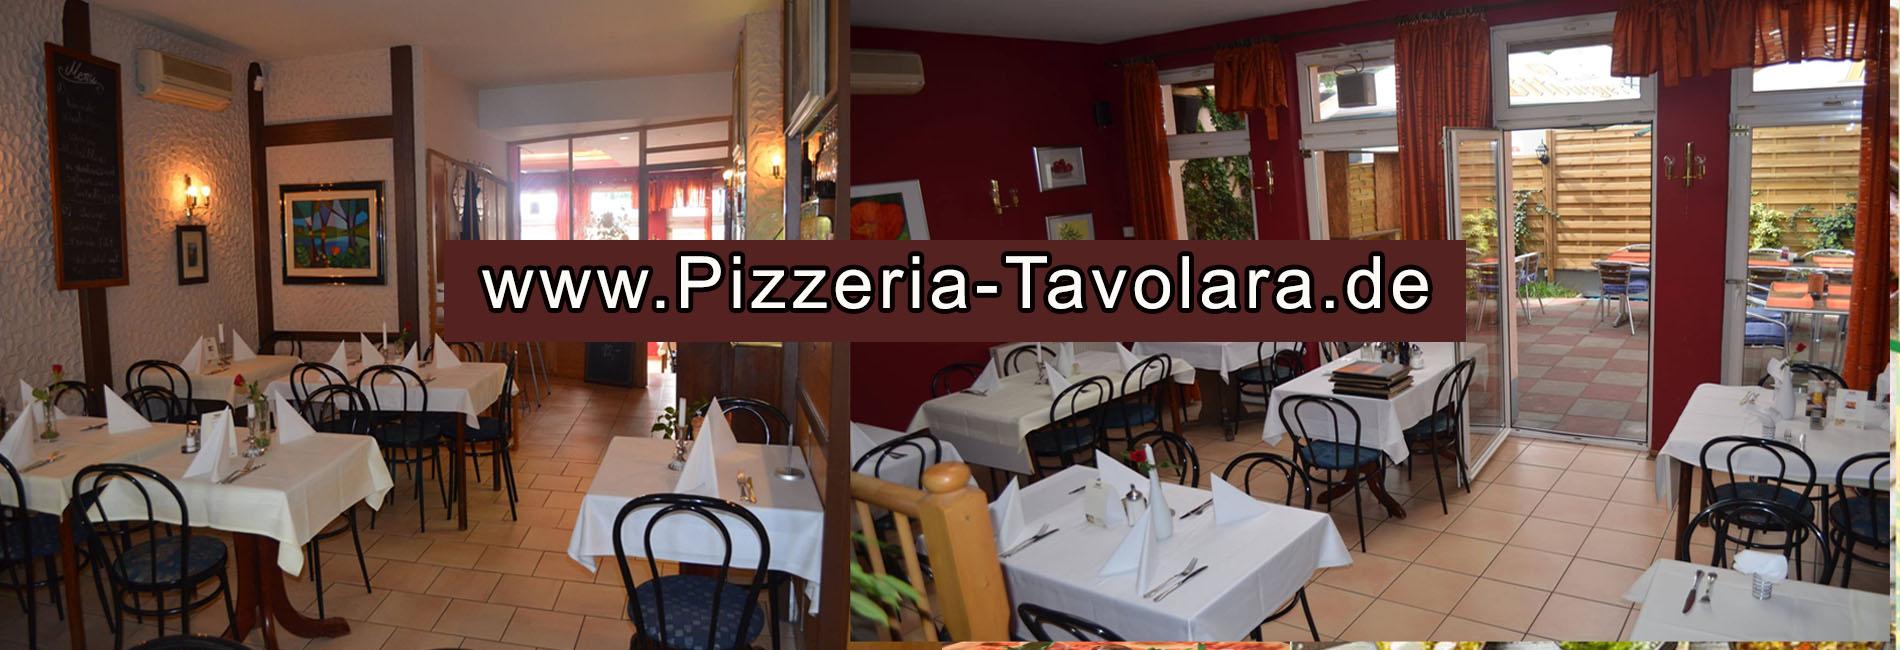 pizzeria-tavolara Frankfurt am Main